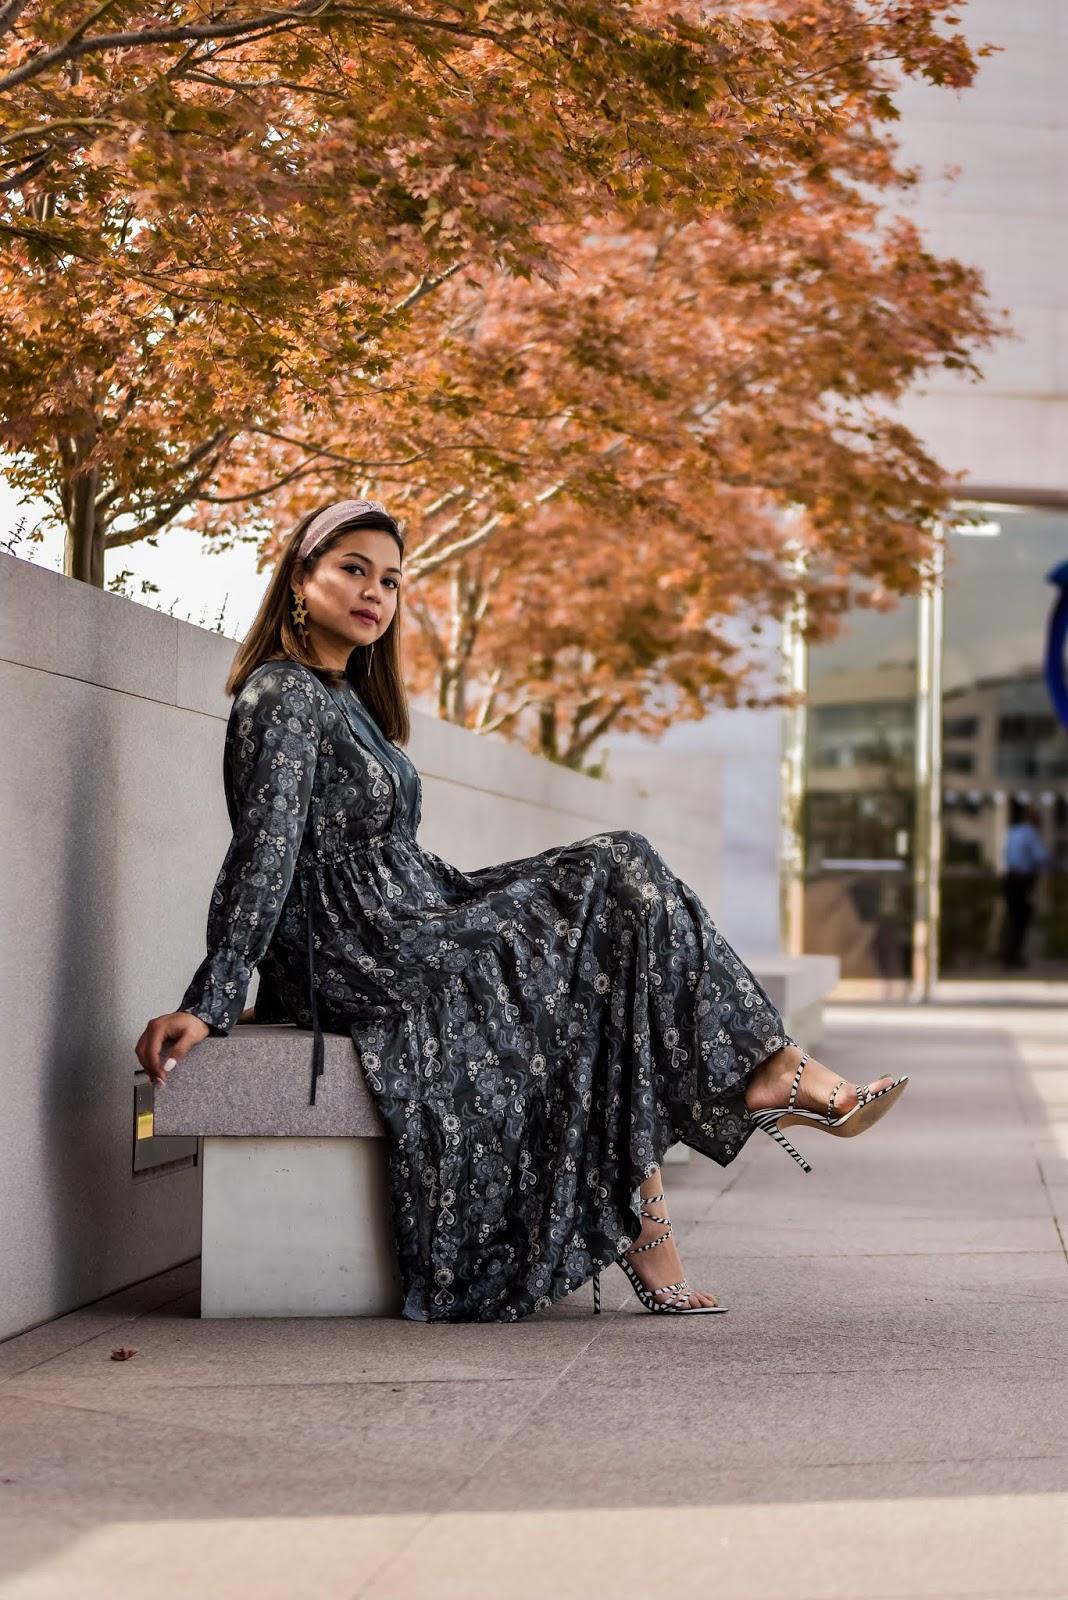 silky dress, new year new you, fashion, street style, girly girl outfit, star earrings, studded headband, silk printed gray dress, myriad musings, saumya shiohare